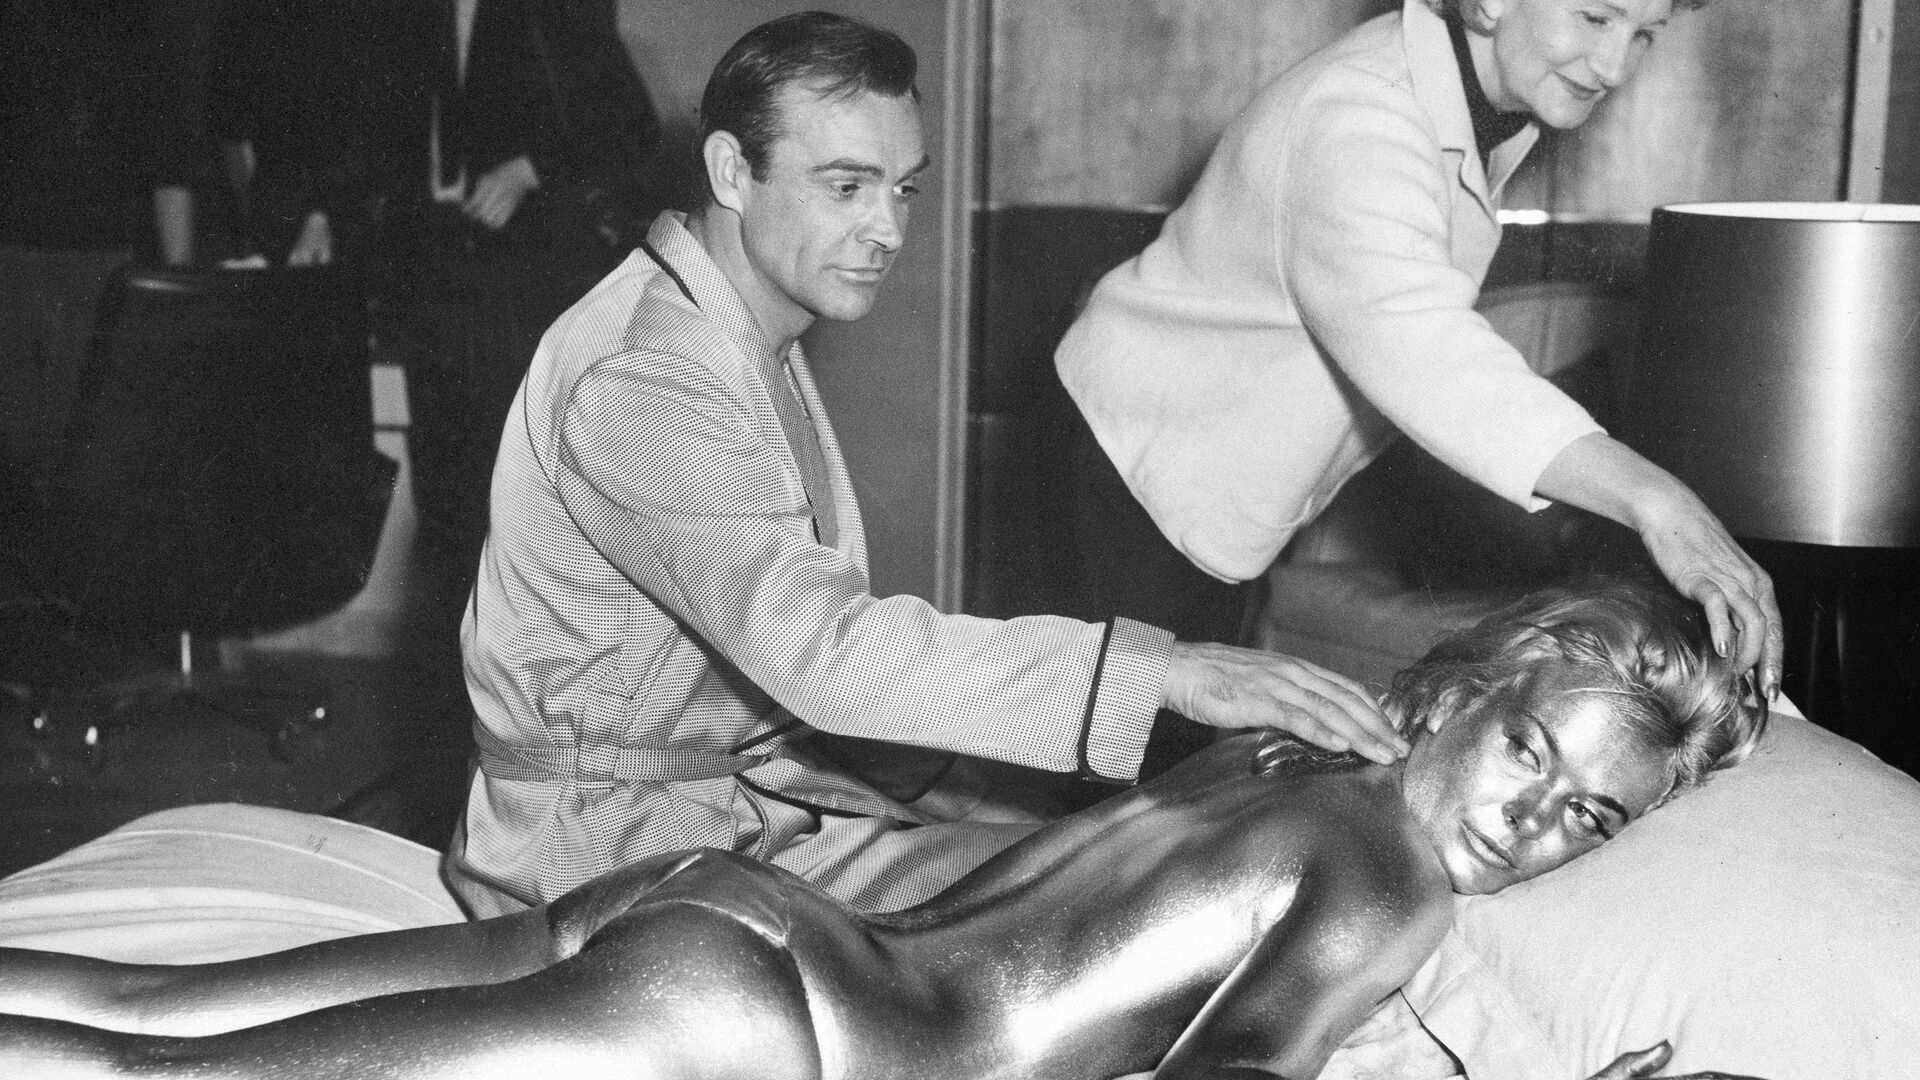 Шотландский актер Шон Коннери с актрисой Ширли Итон, 1964 год - Sputnik International, 1920, 23.09.2021